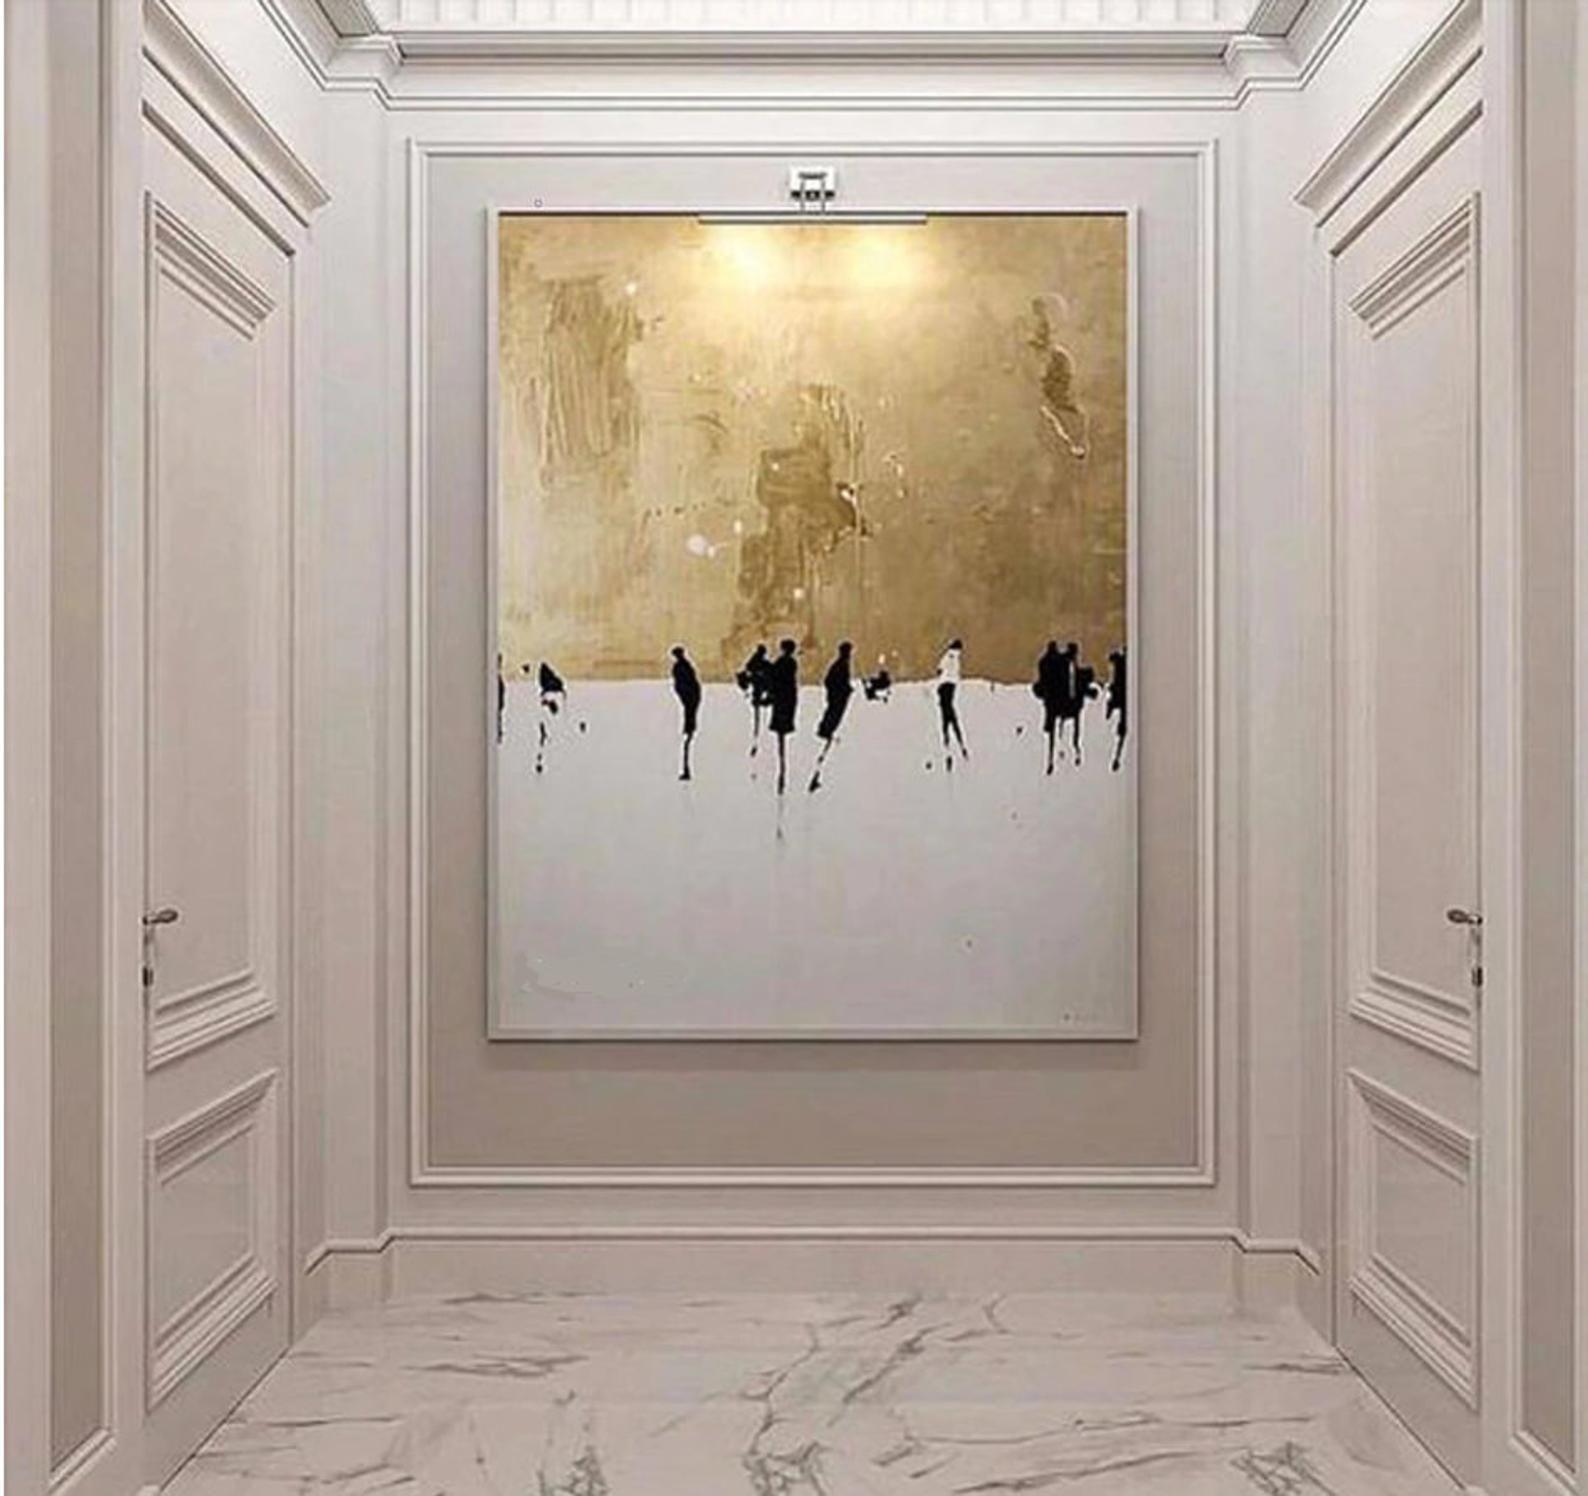 LARGE MODERN ABSTRACT Wall Art - Original Abstract